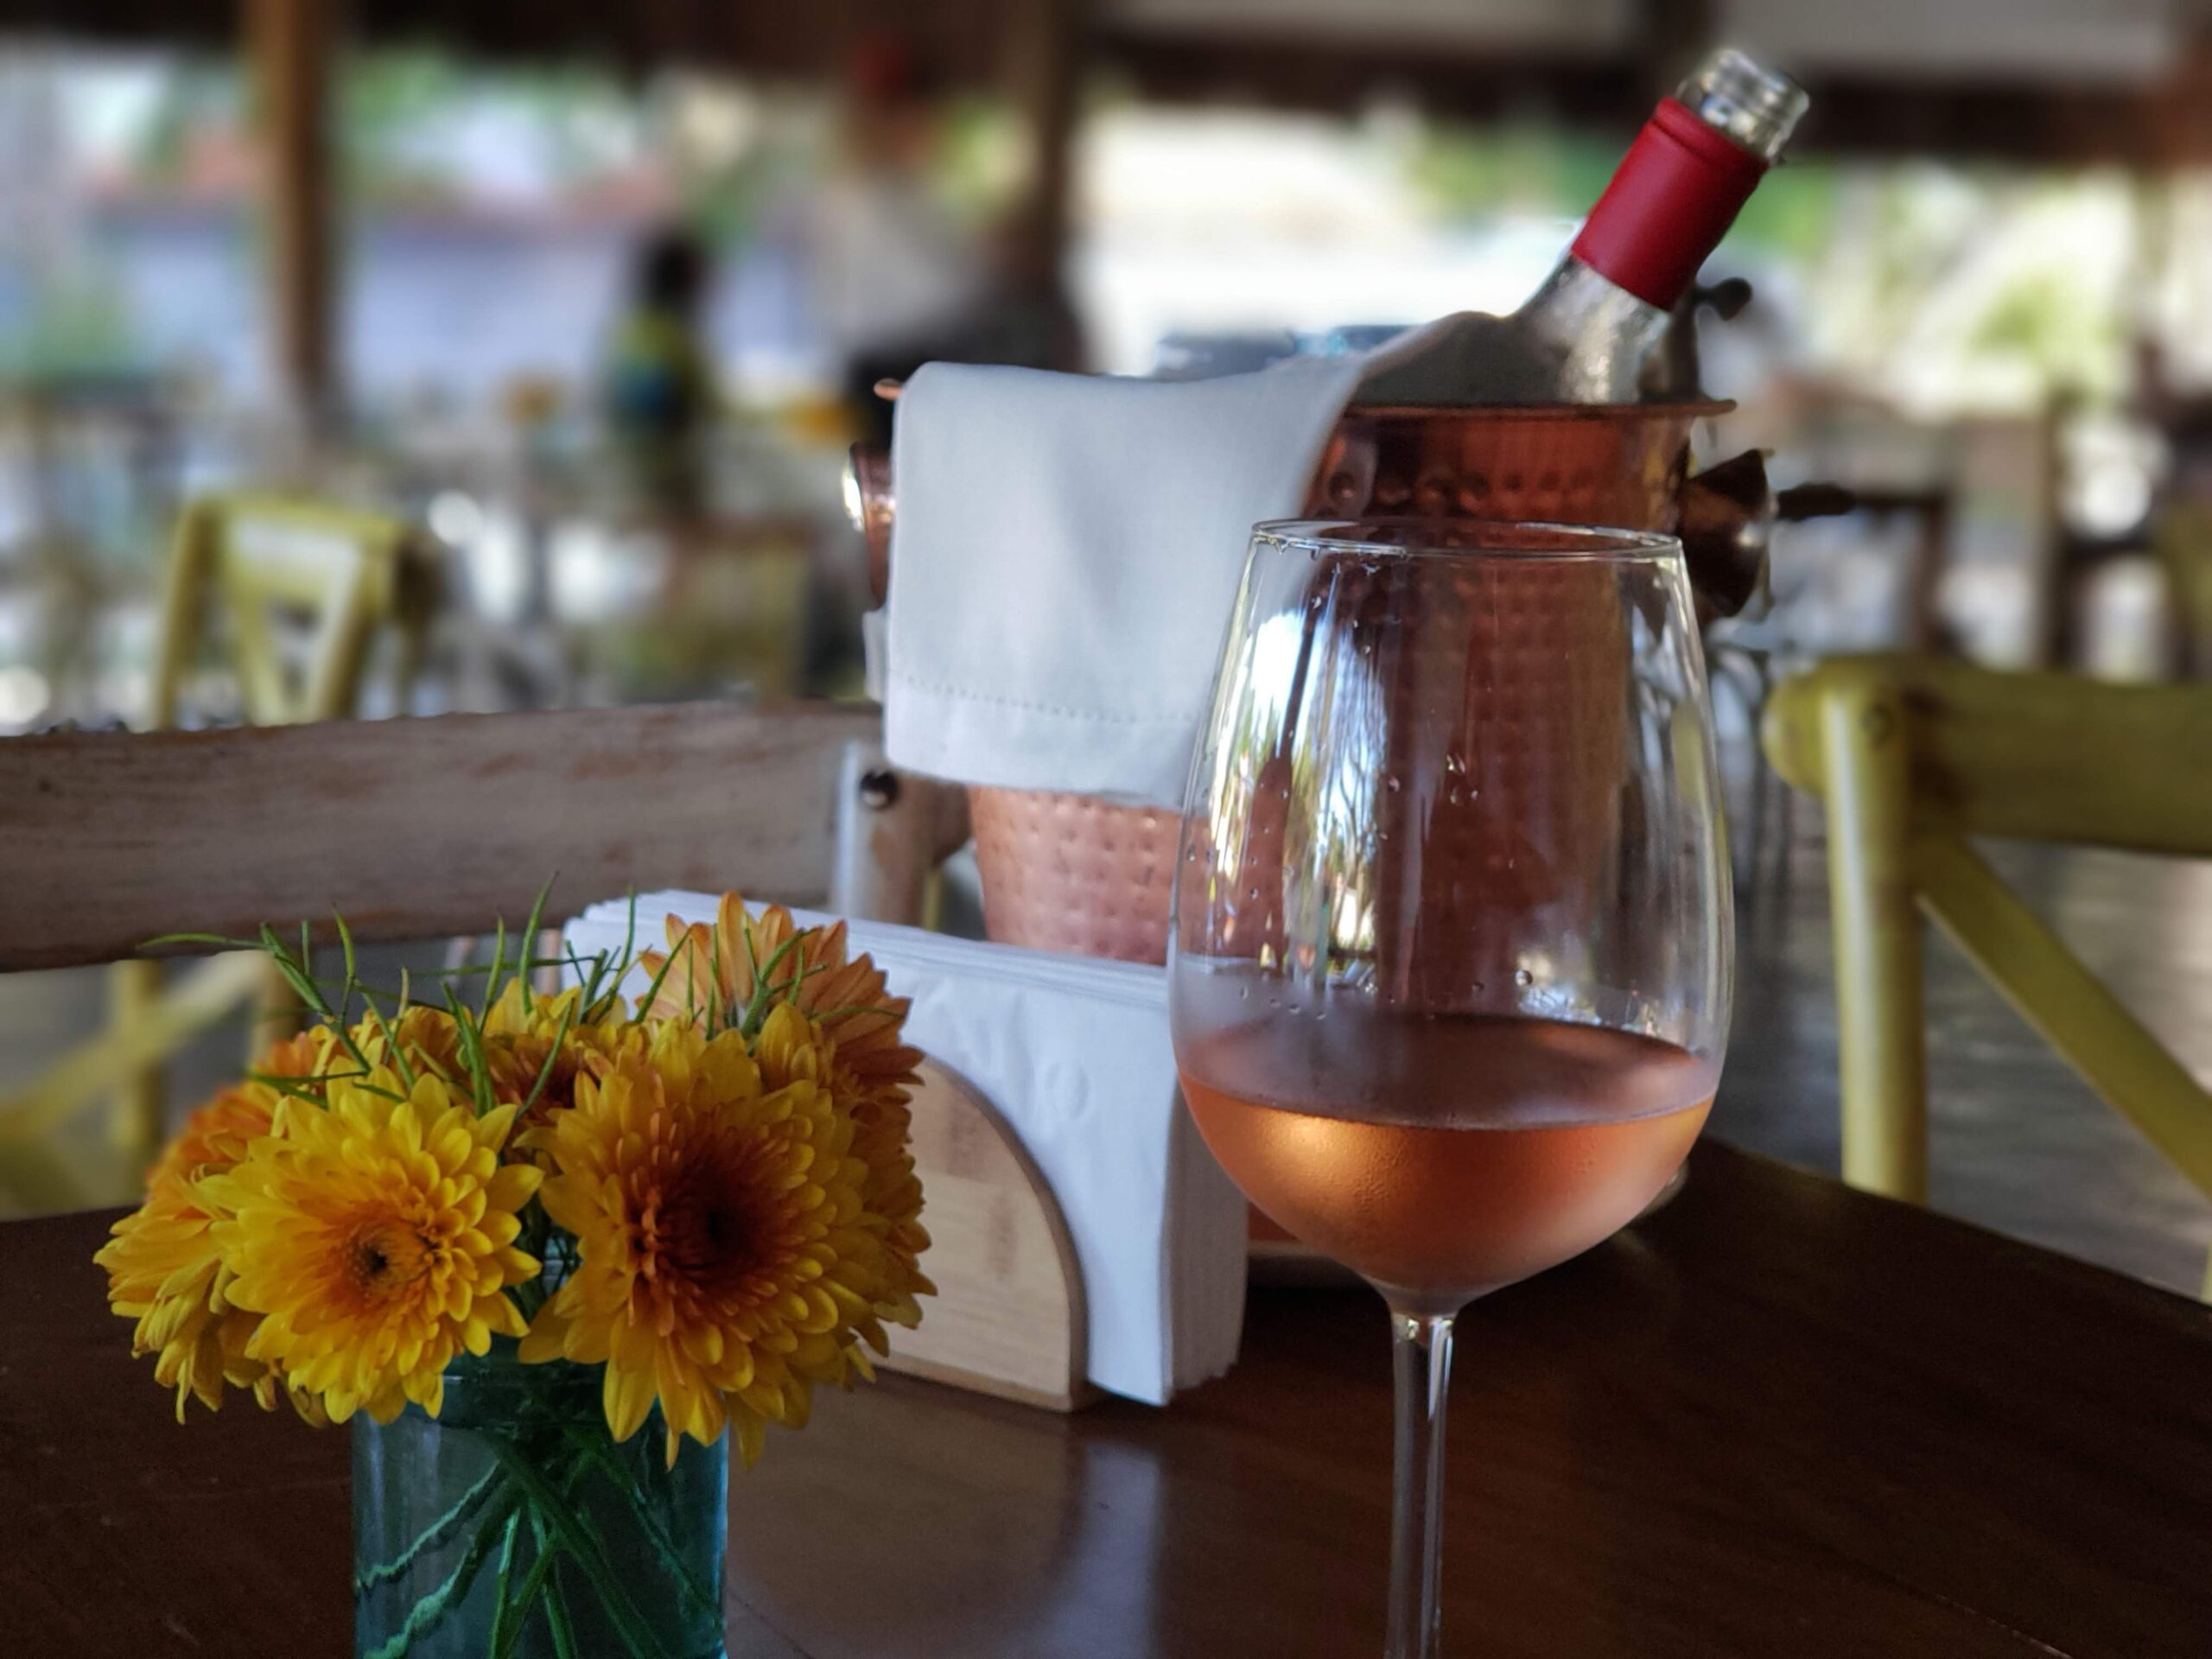 Rose wine and Sunflowers